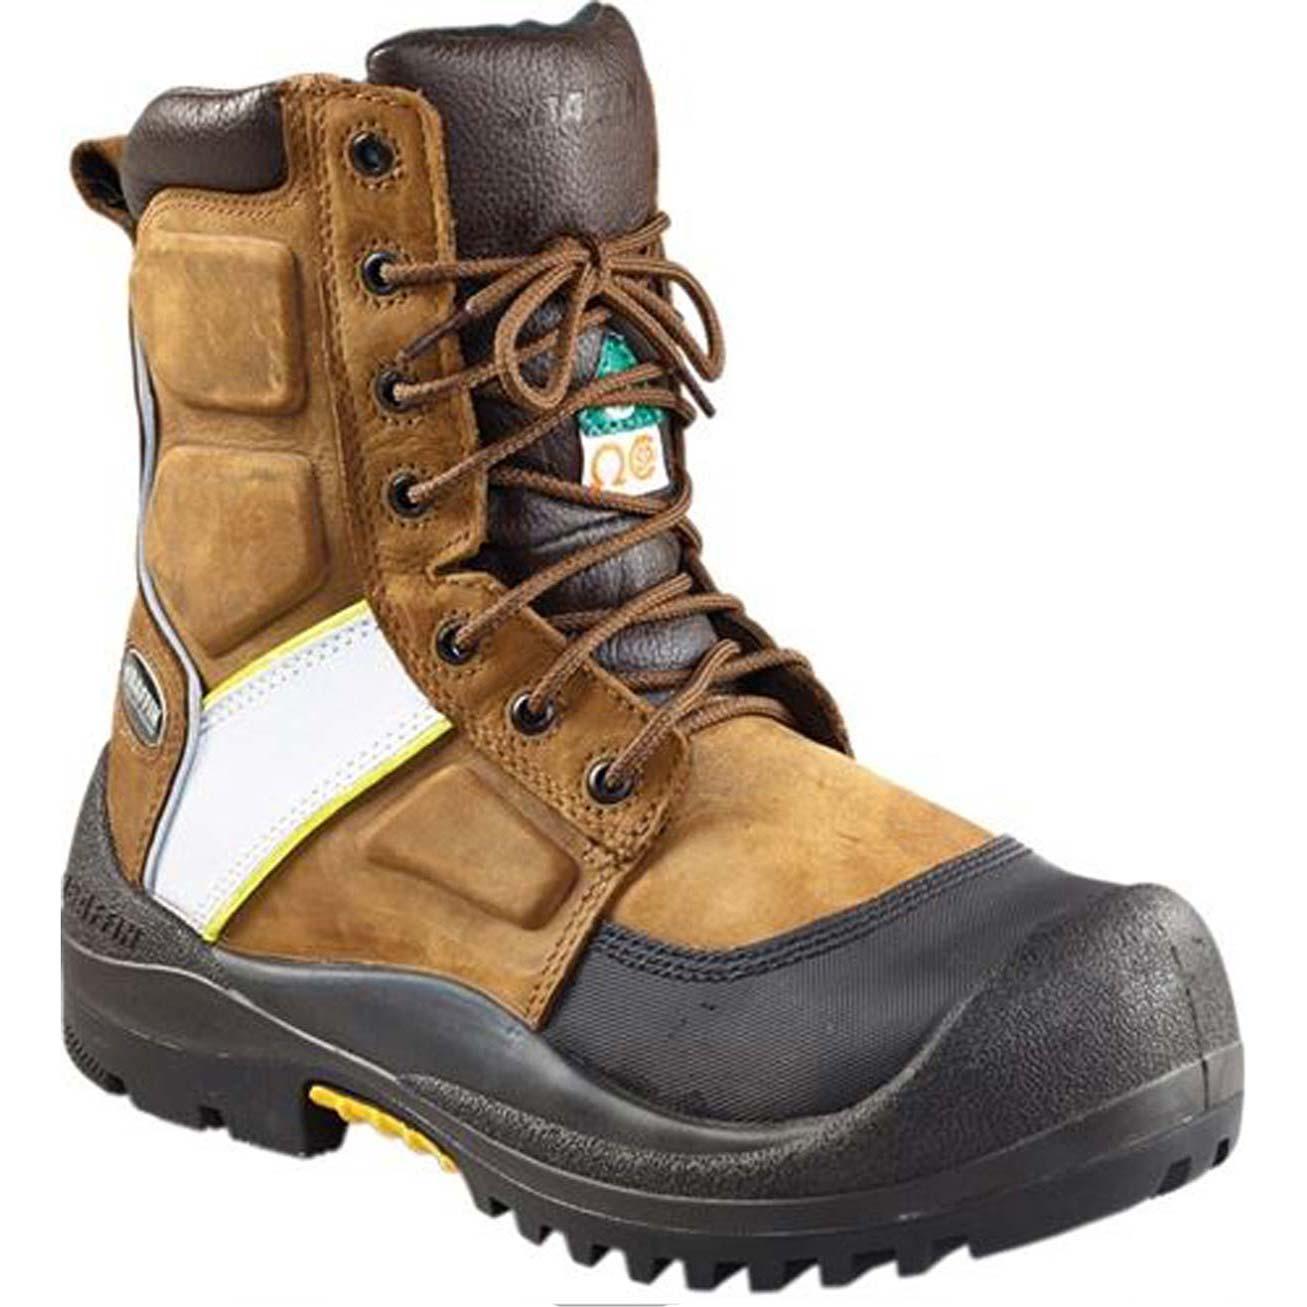 Baffin Waterproof Shoes Men